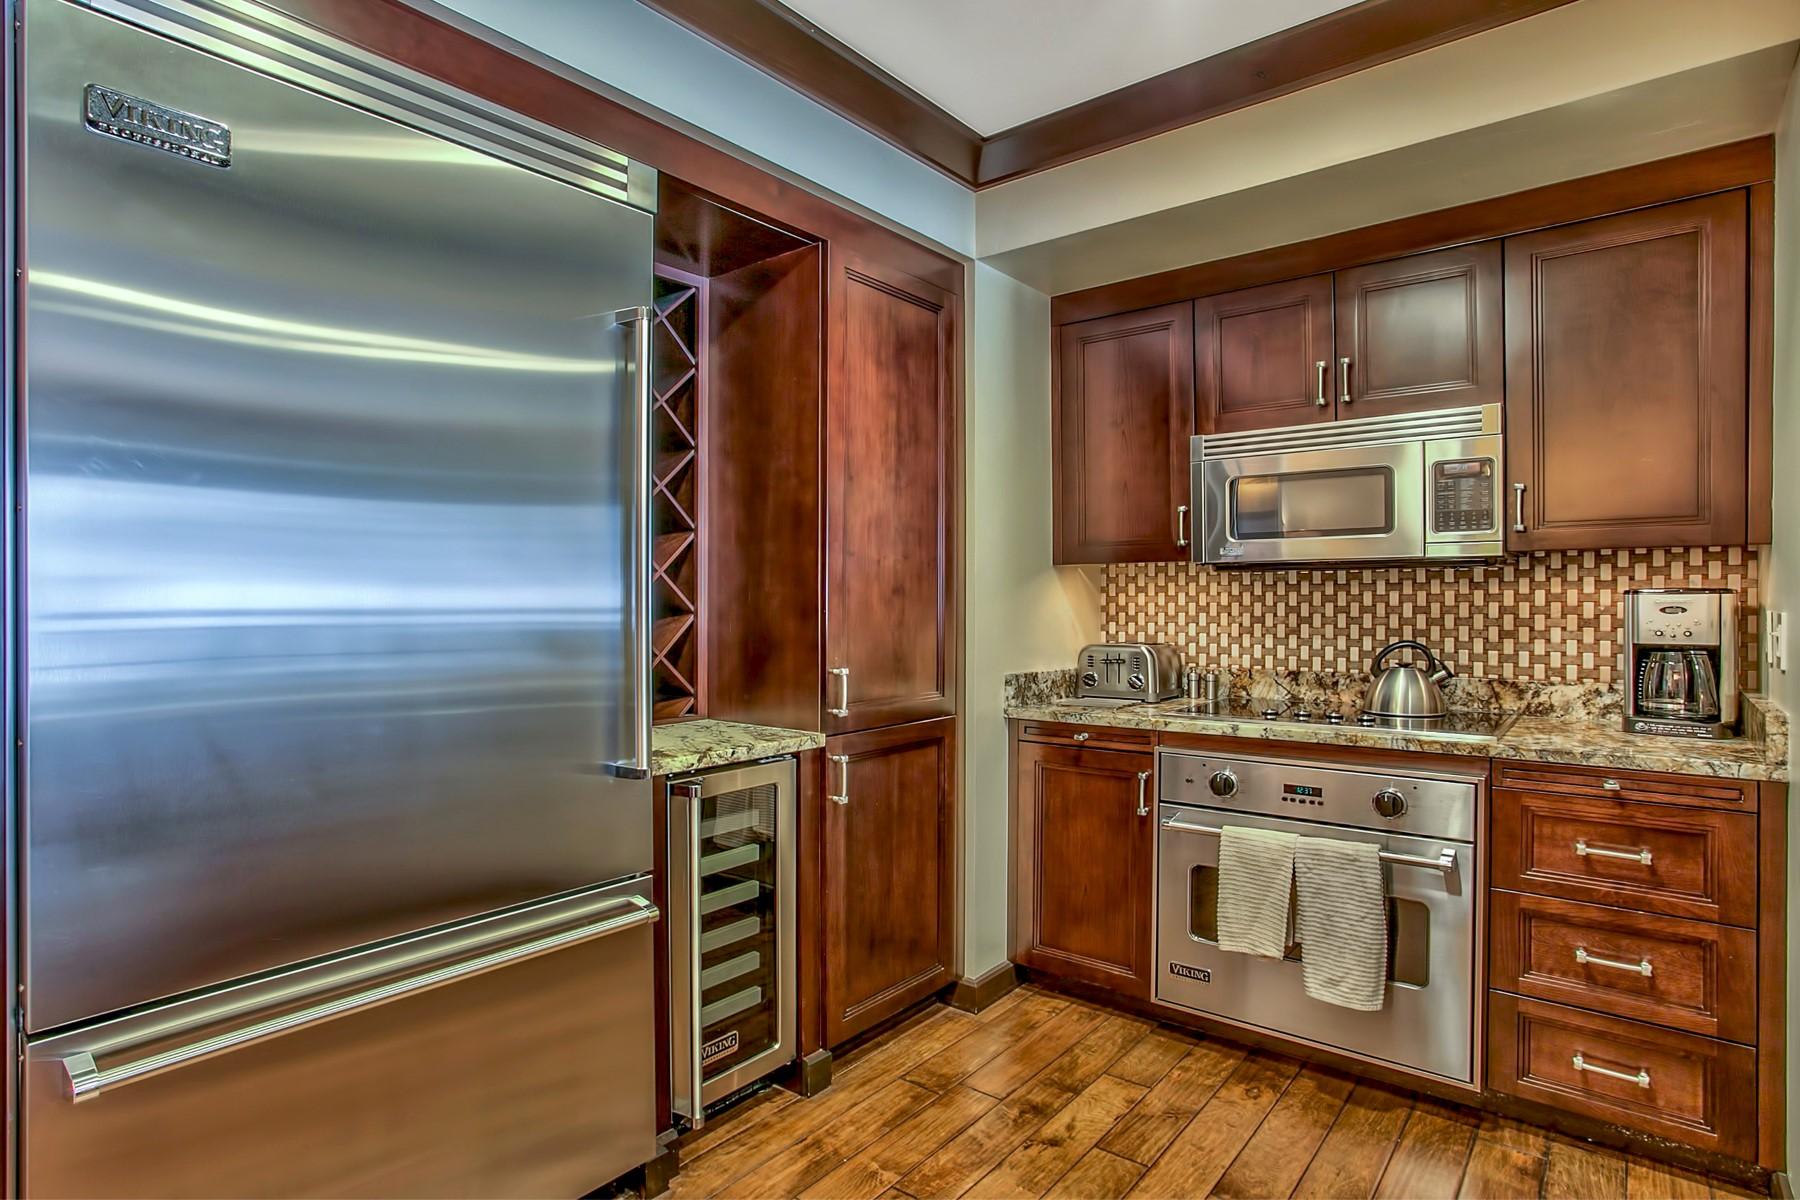 Additional photo for property listing at Ritz-Carlton Destination Club - Lake Tahoe at 13051 Ritz Carlton Highlands 4405 13051 Ritz-Carlton Highlands # 4405 Truckee, California 96161 Estados Unidos